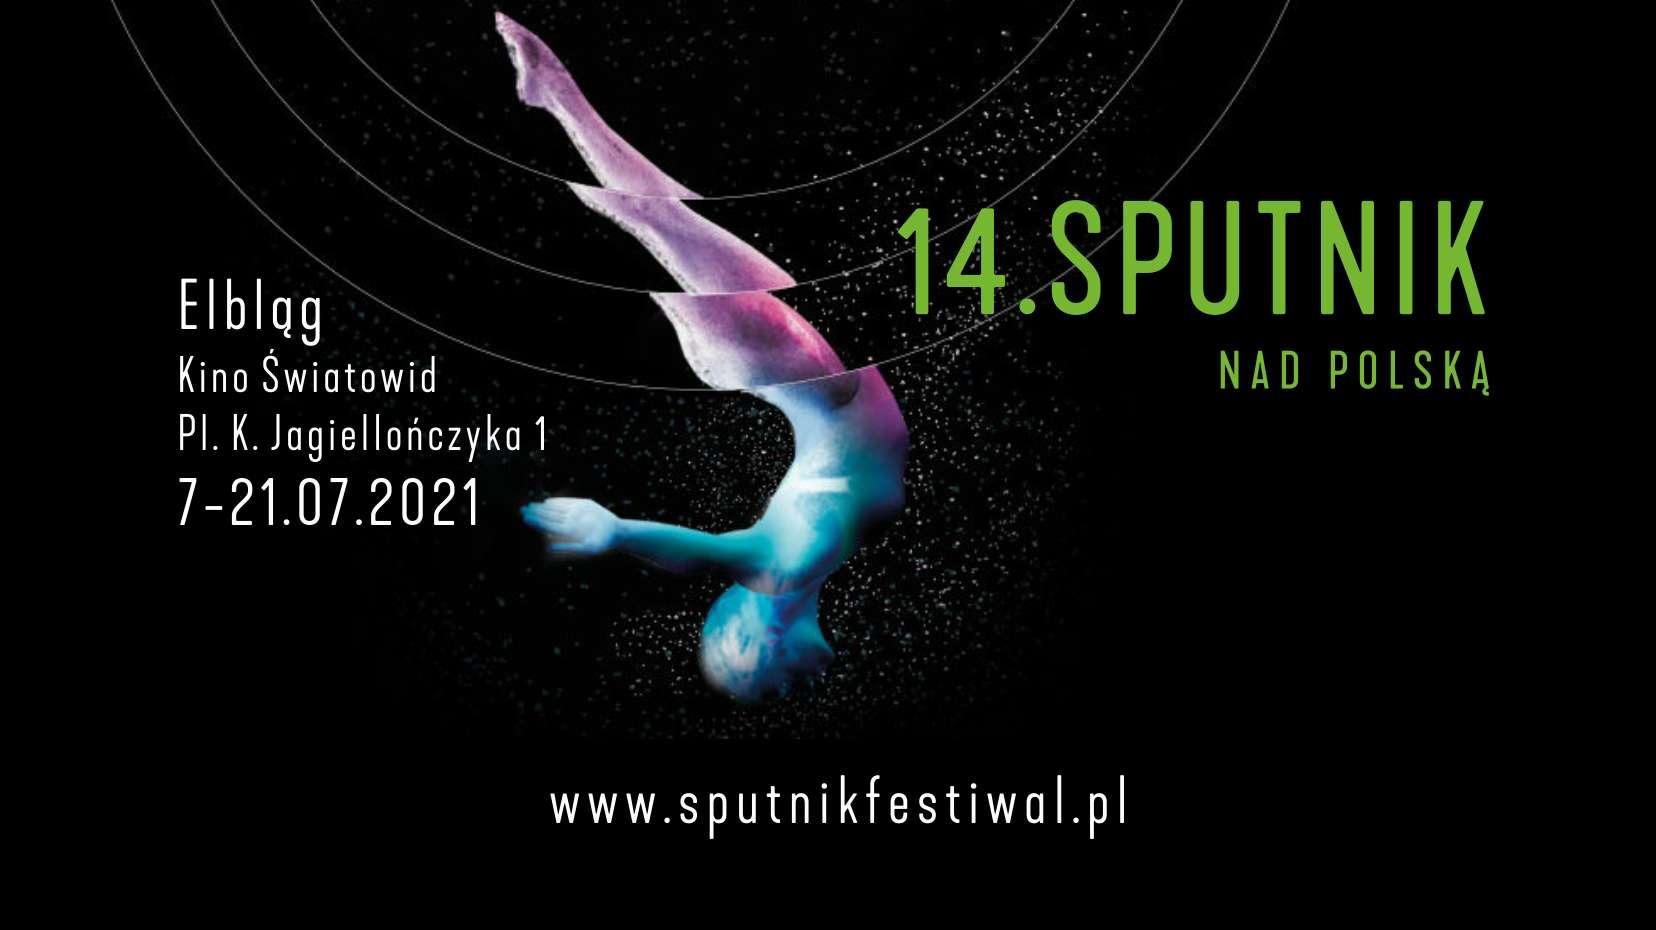 FFR Sputnik nad Polską